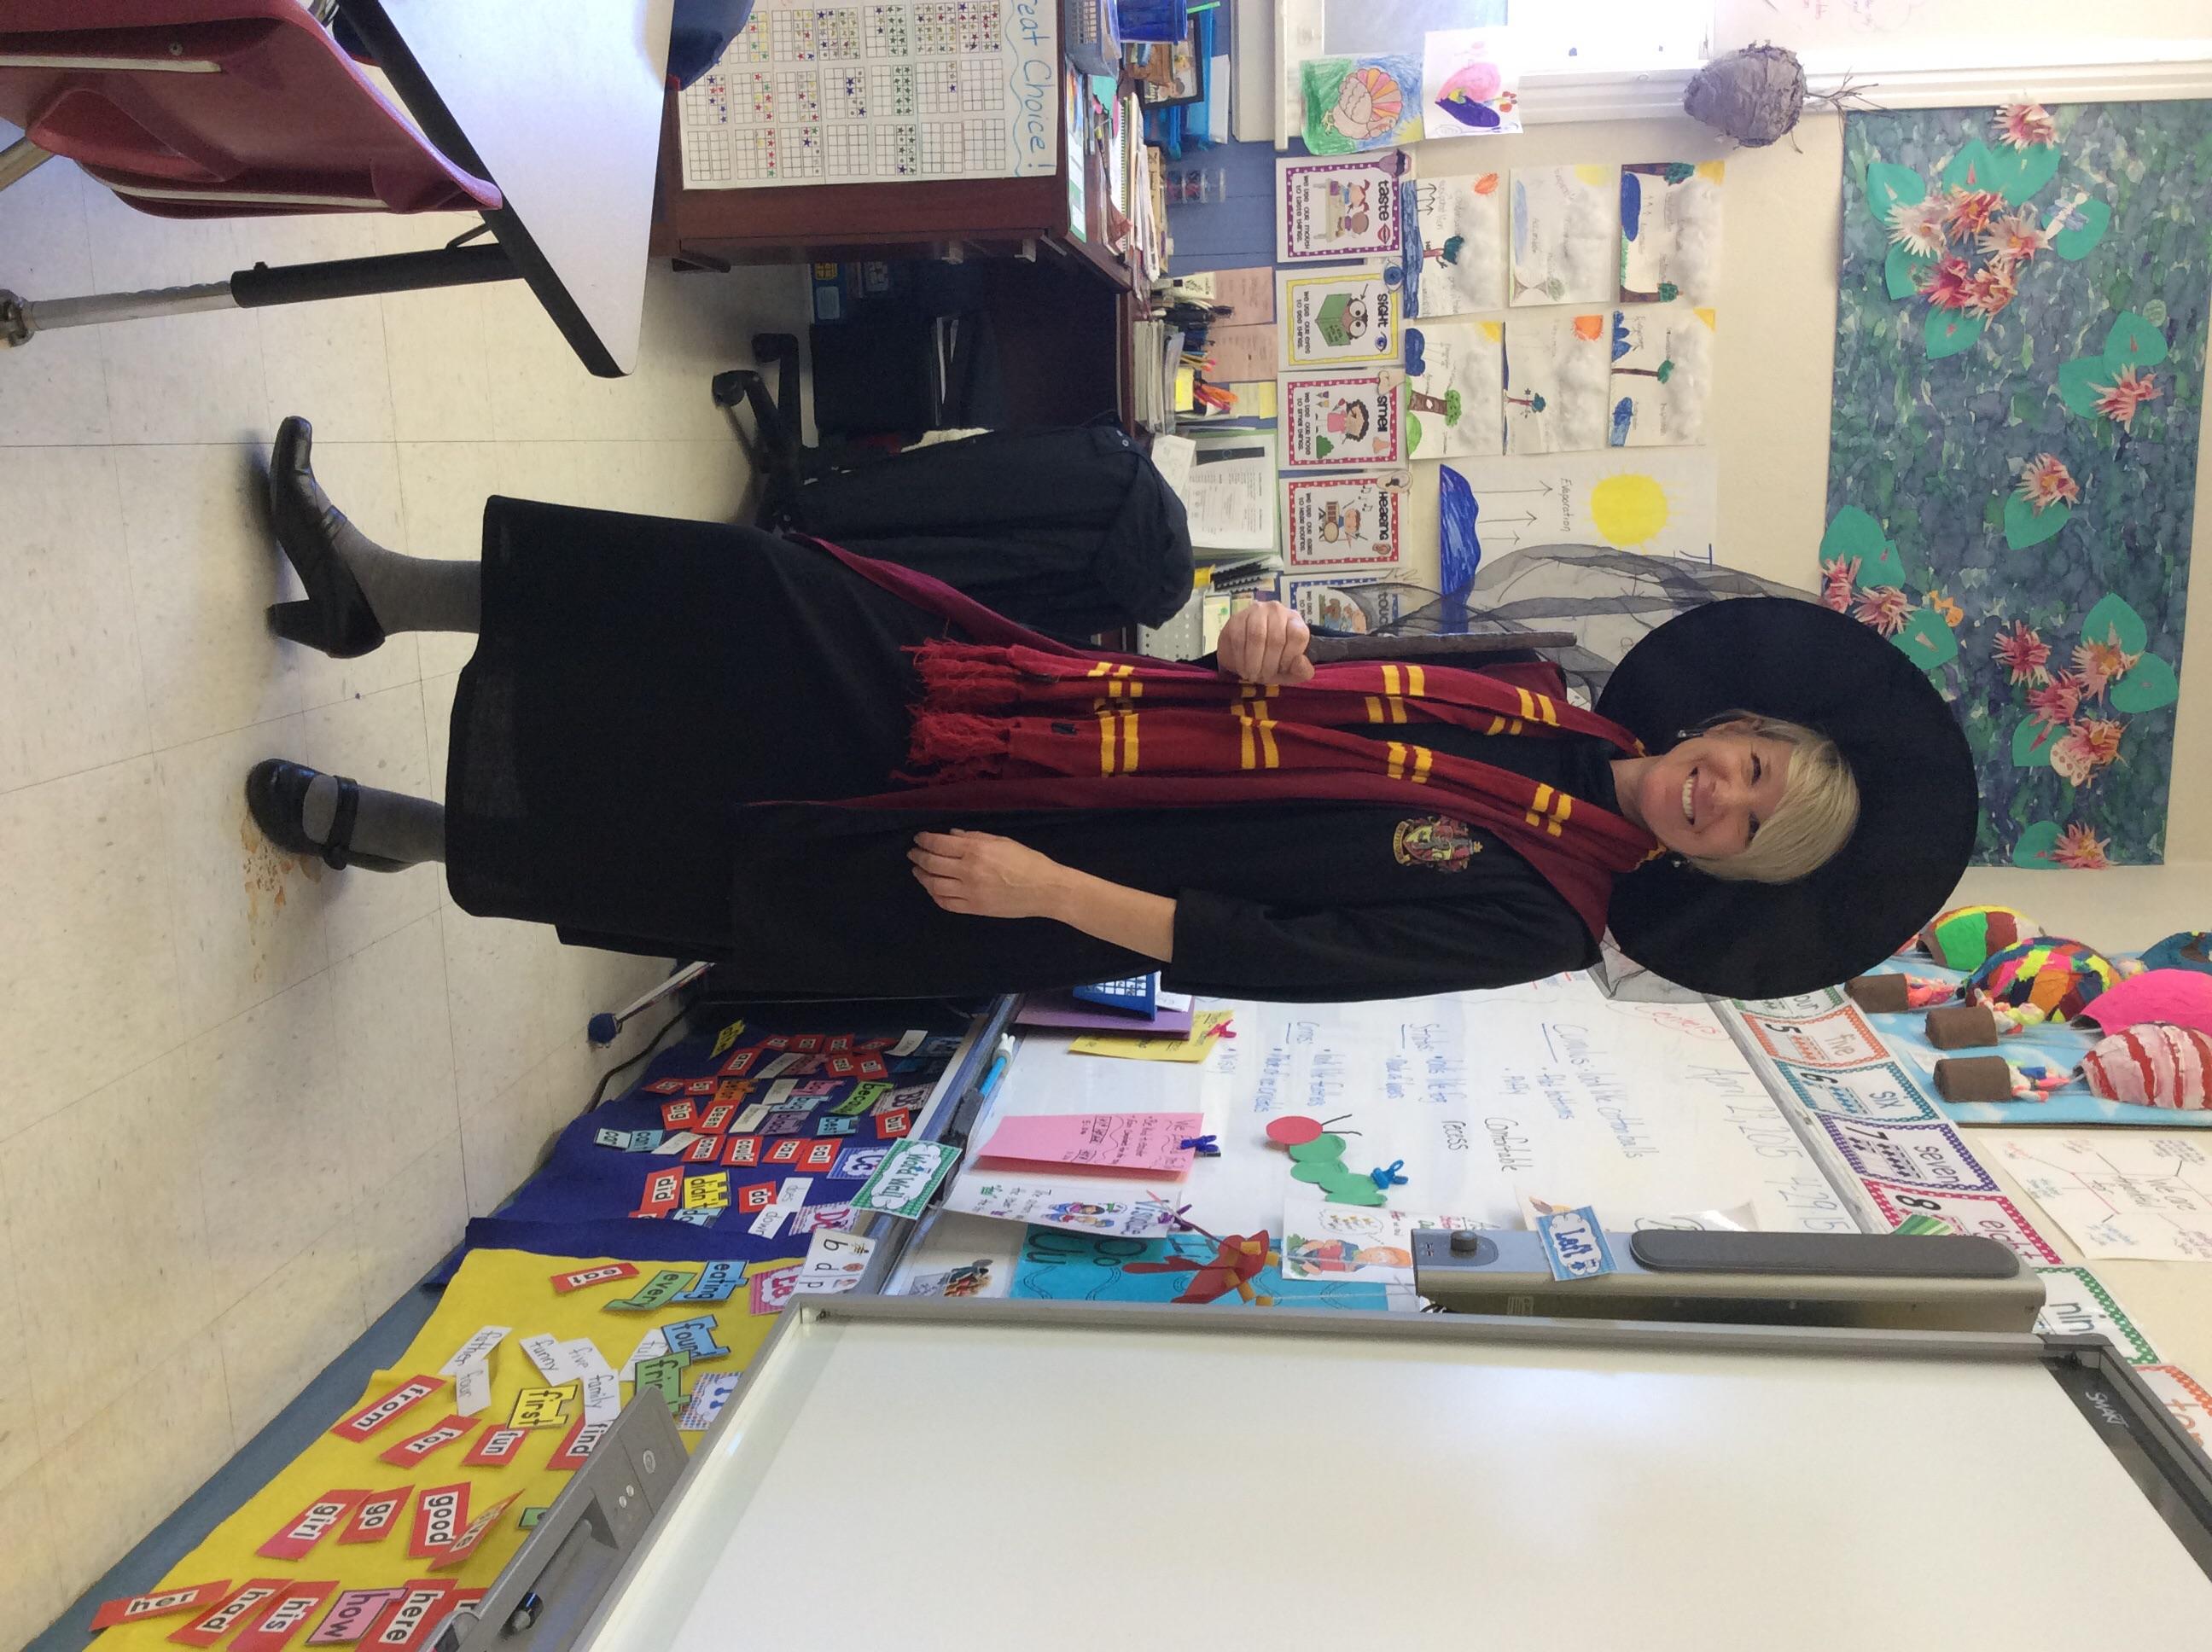 Mrs. Costello is Professor Dumbledor from Harry Potter